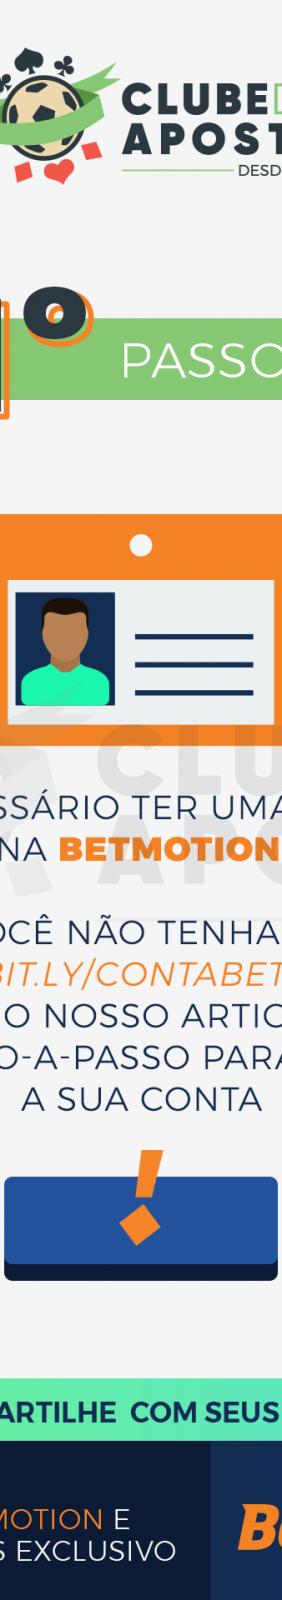 01-como-apostar-na-betmotion